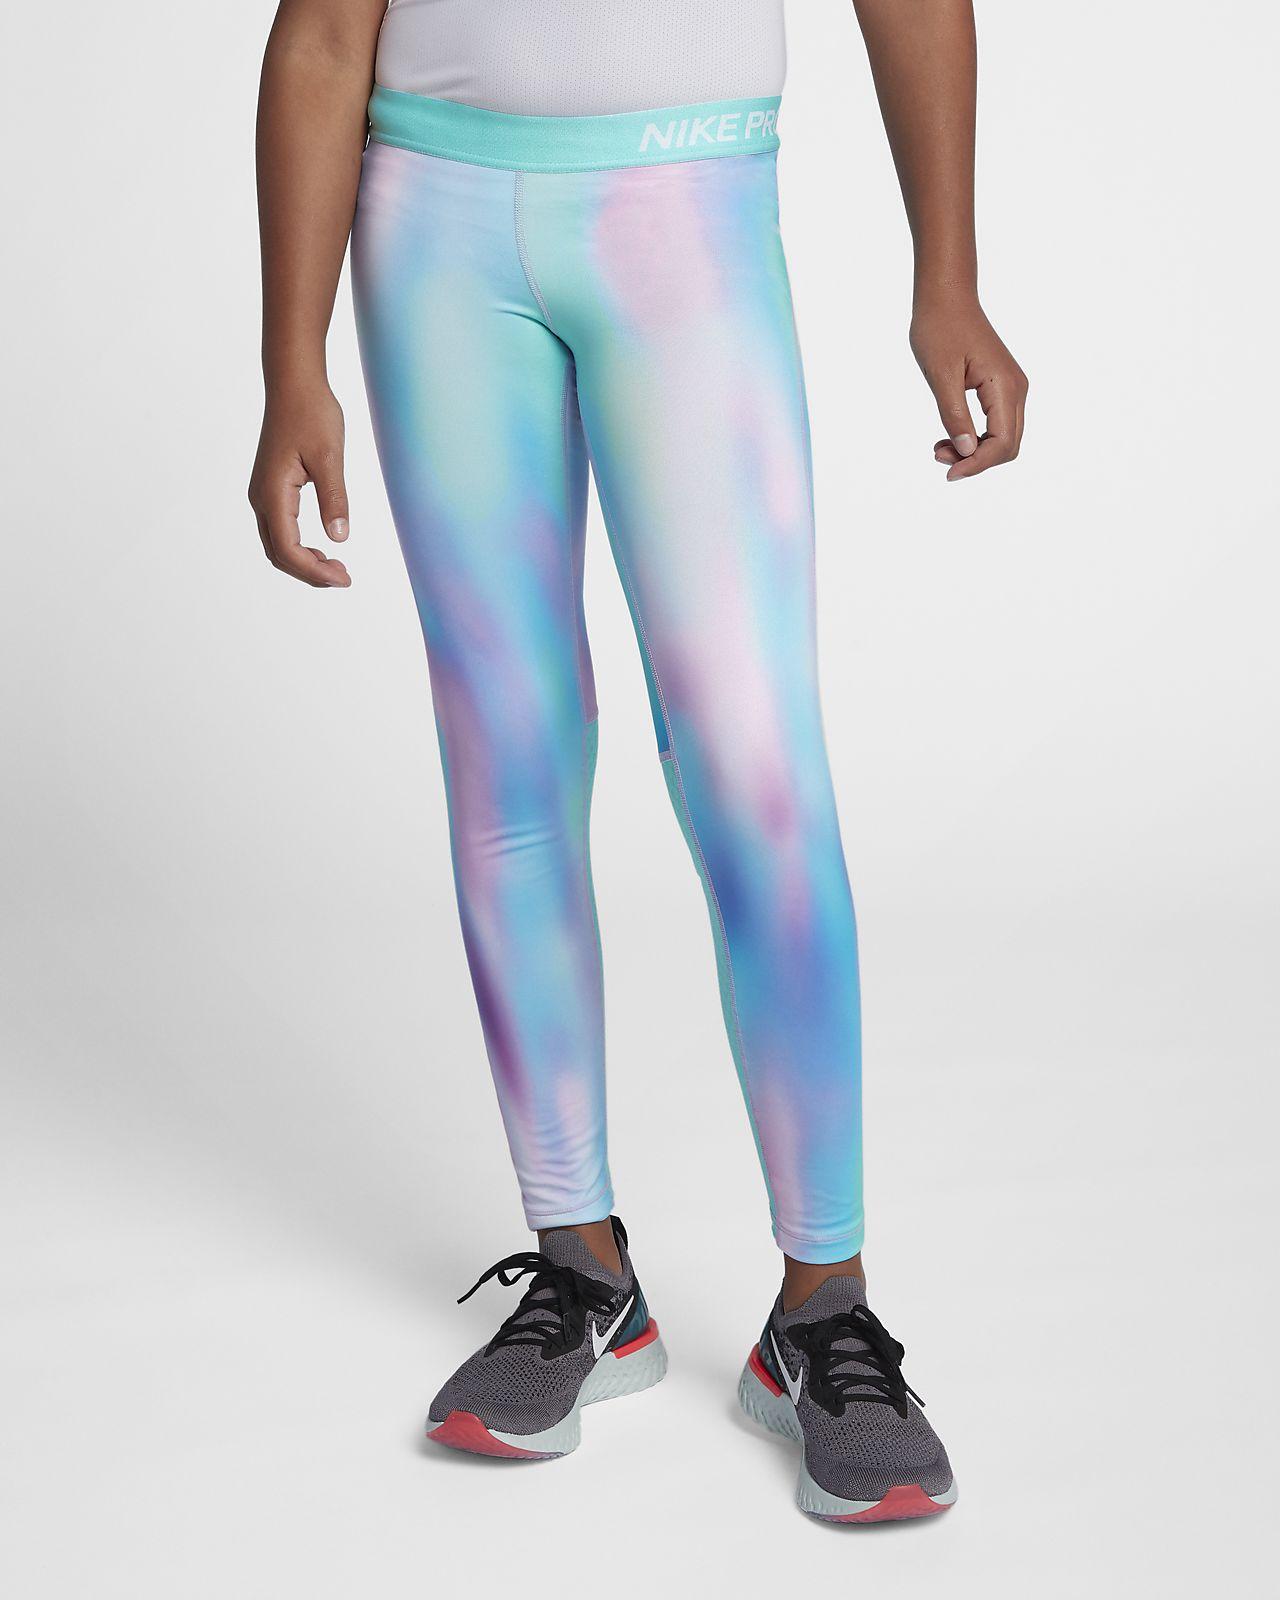 80dd2eee1 Mallas estampadas para niña Nike Pro Warm. Nike.com MX